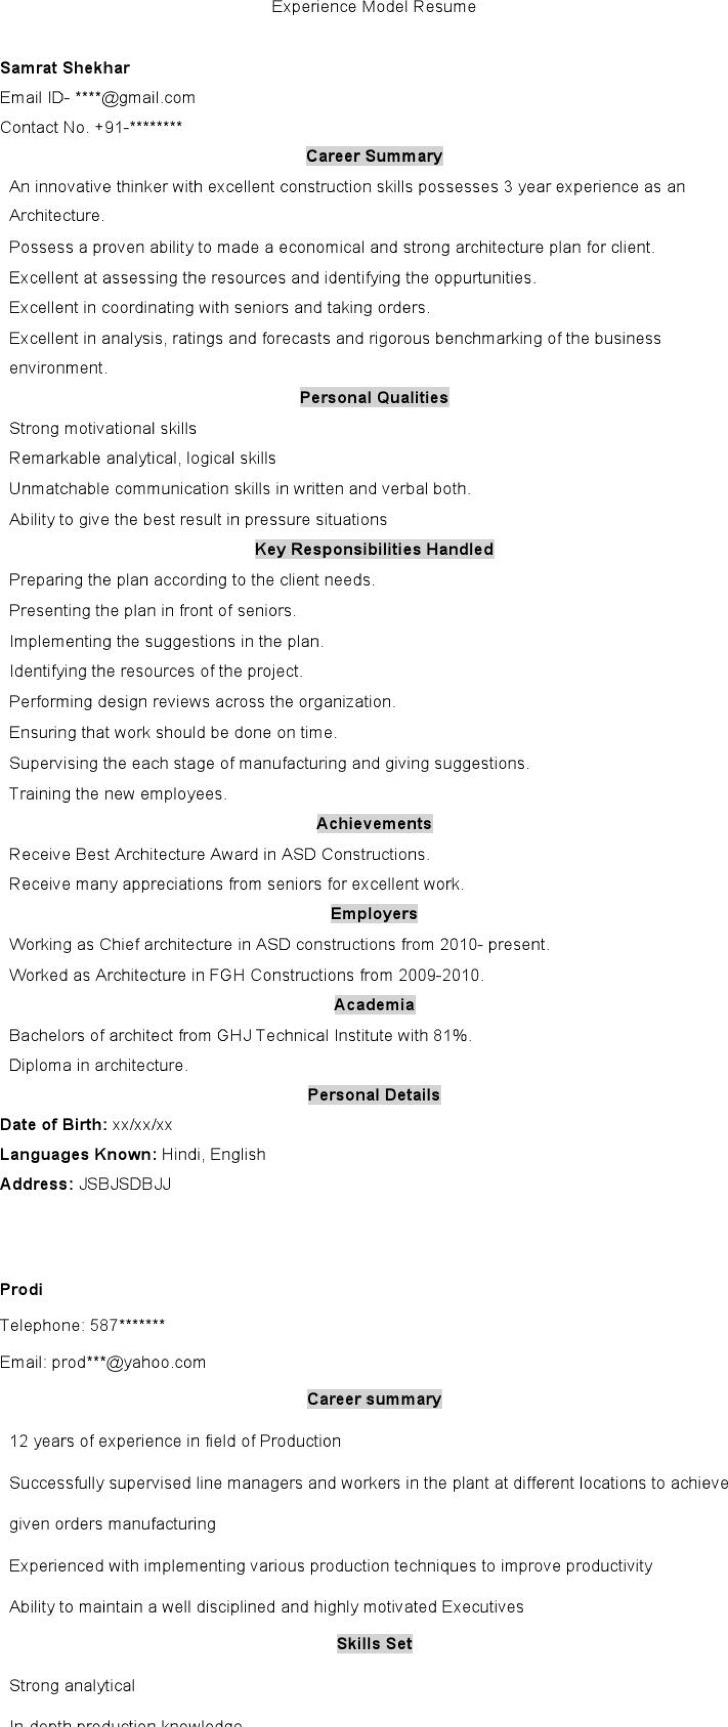 Experience Model Resume